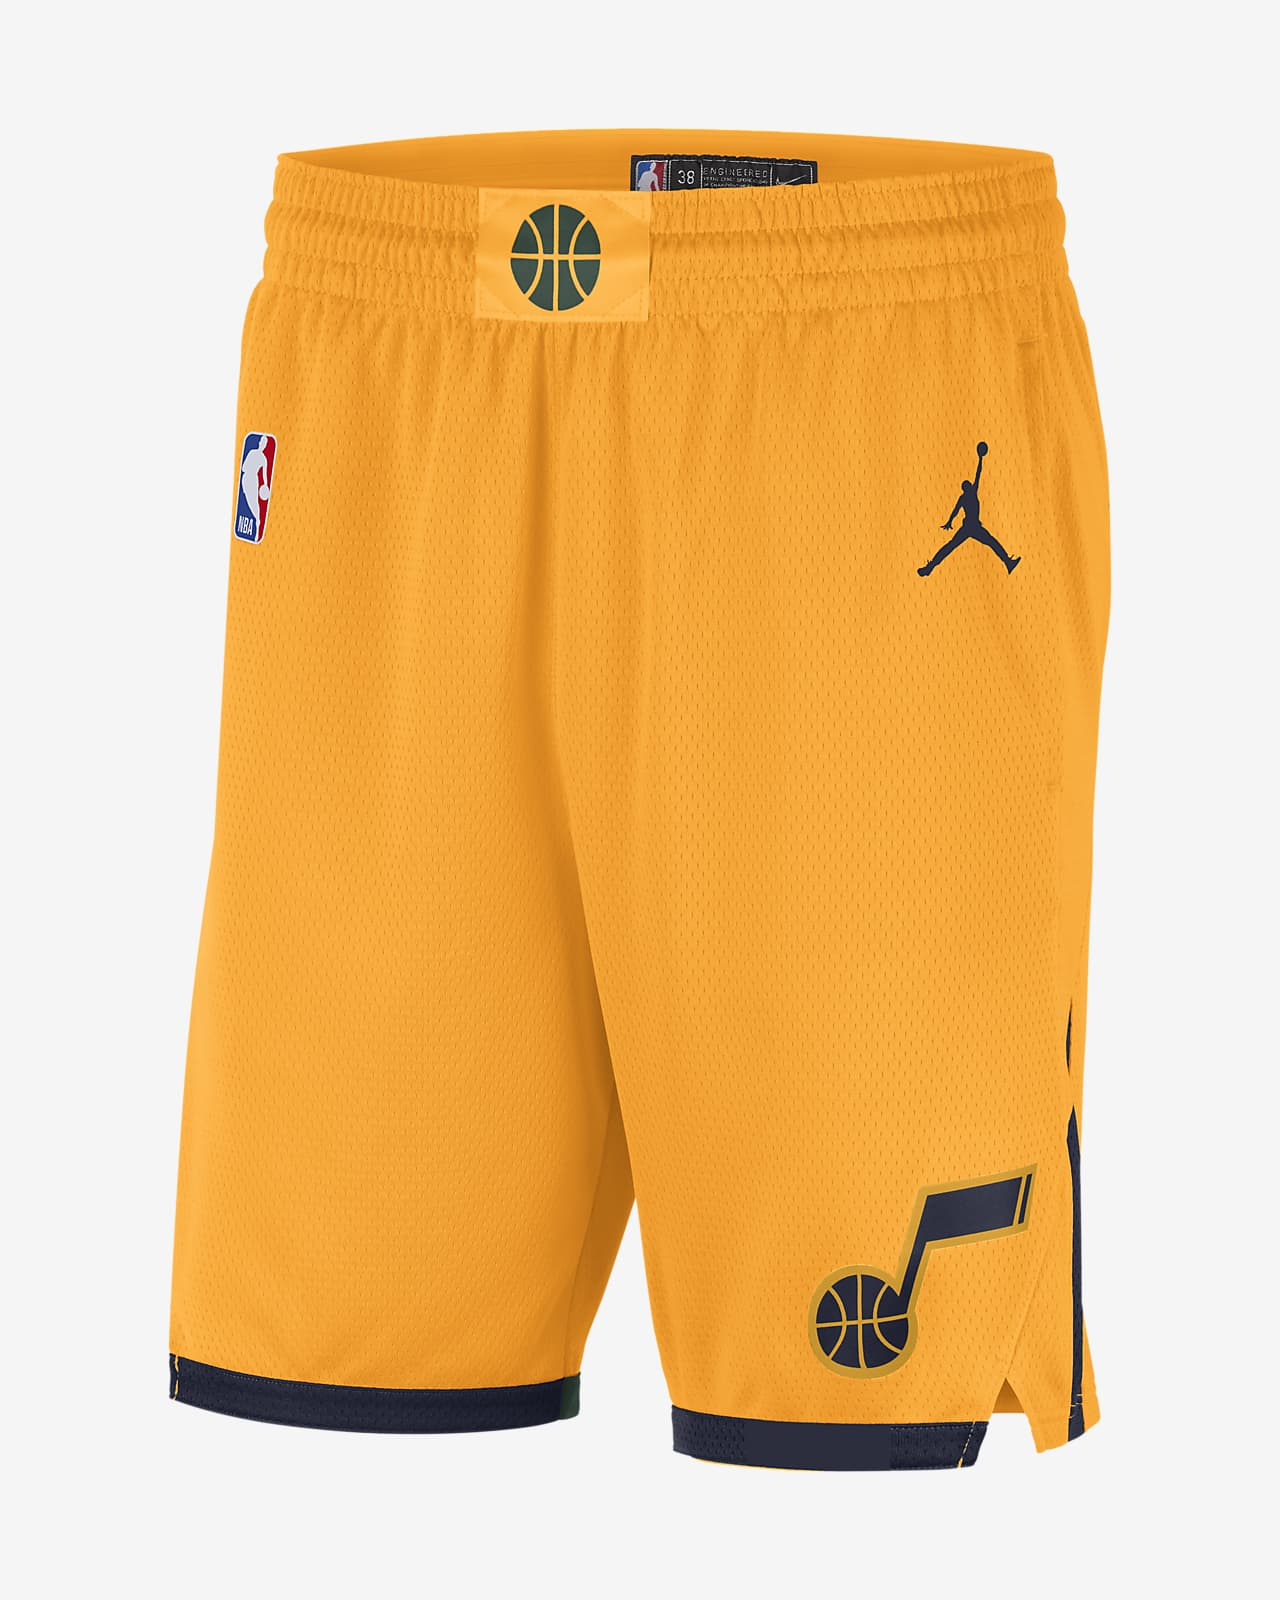 Jazz Statement Edition 2020 Men's Jordan NBA Swingman Shorts